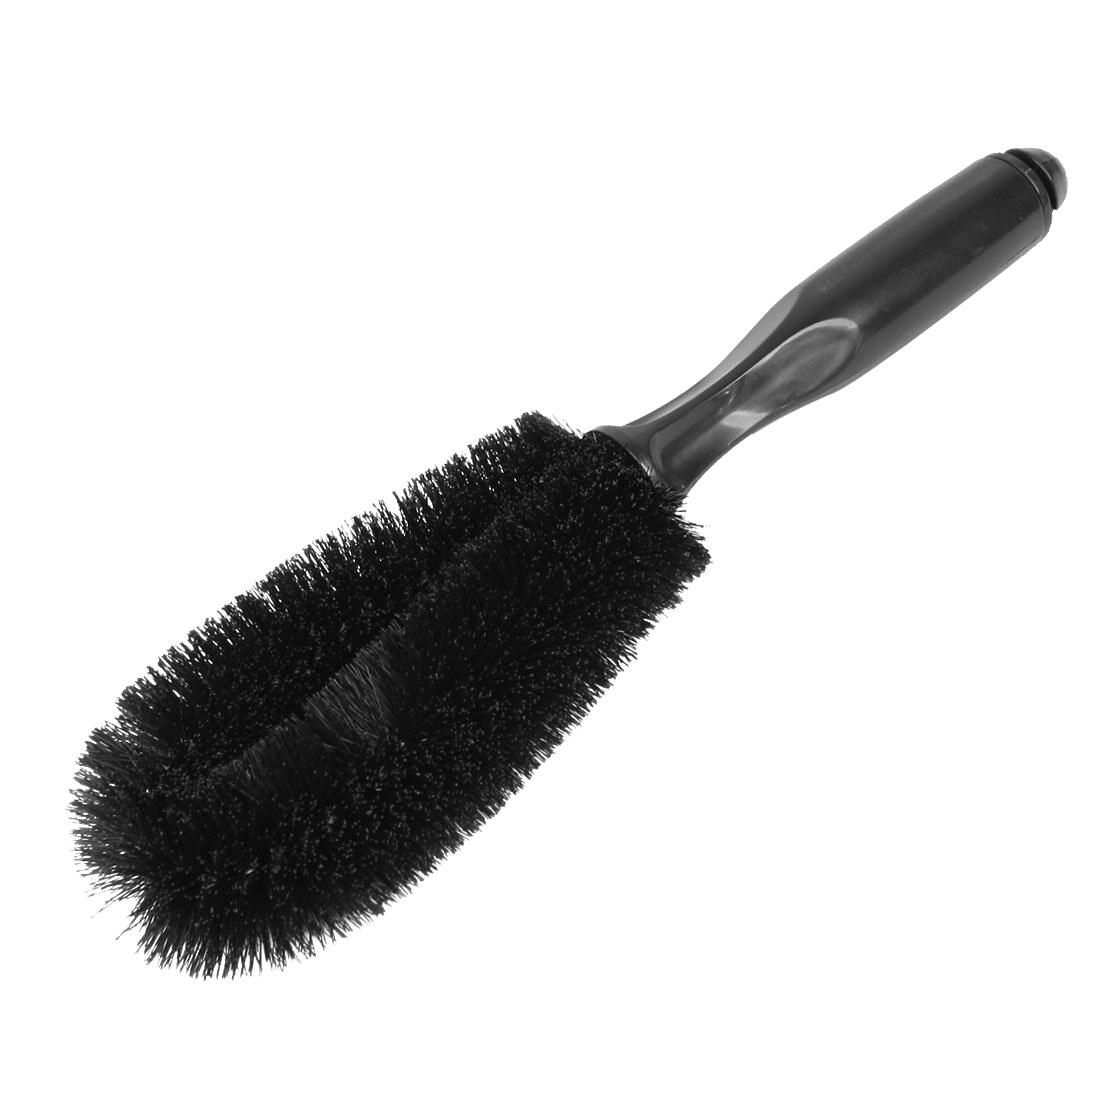 Black Truck Car Auto Wheel Tire Rim Brush Wash Cleaning Tool 10.6 Long